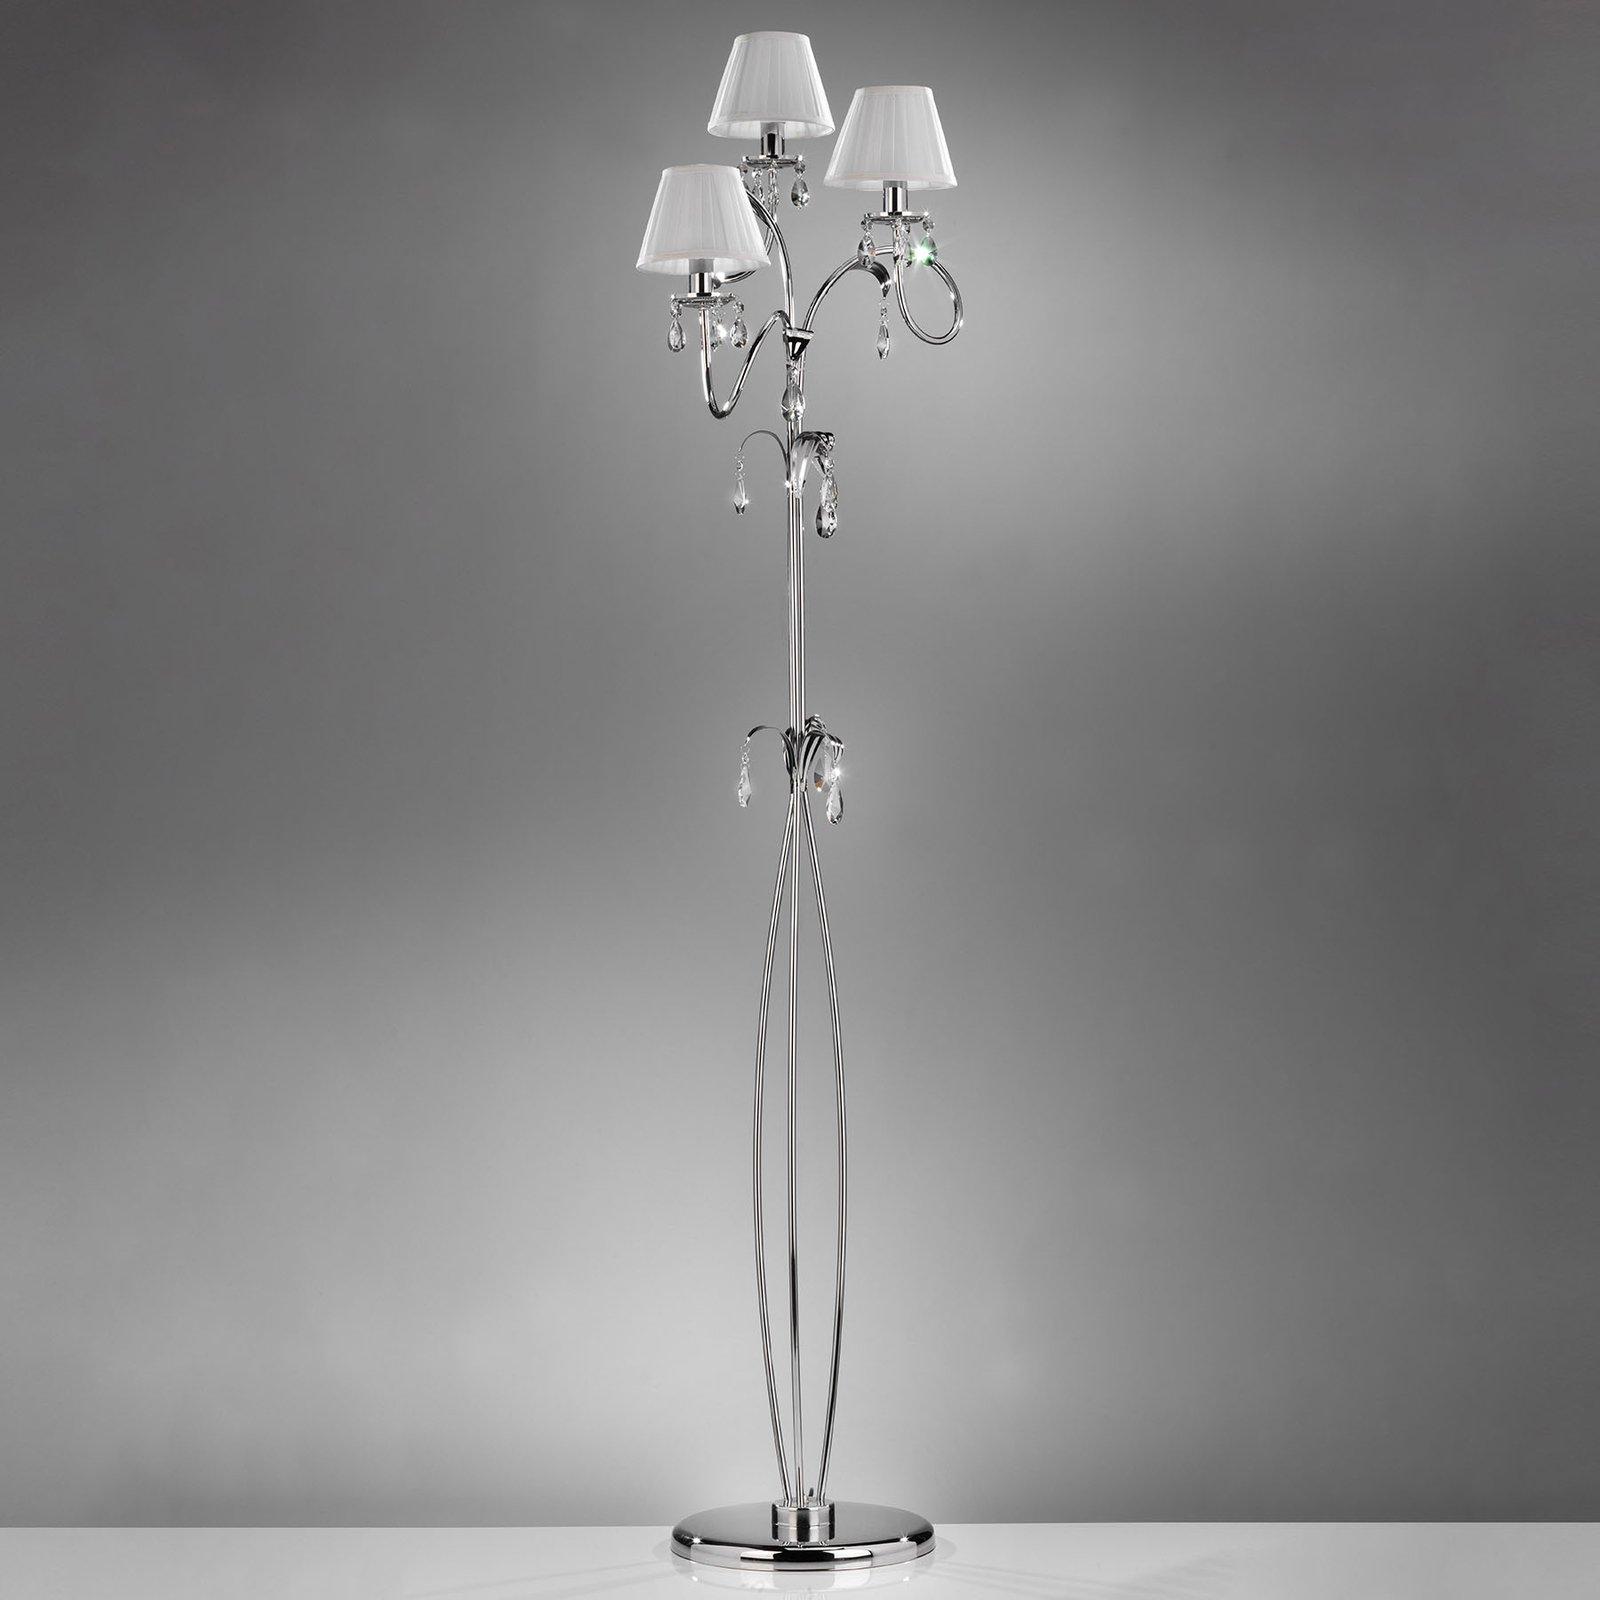 Gulvlampe Jacqueline, 3 lyskilder, hvit